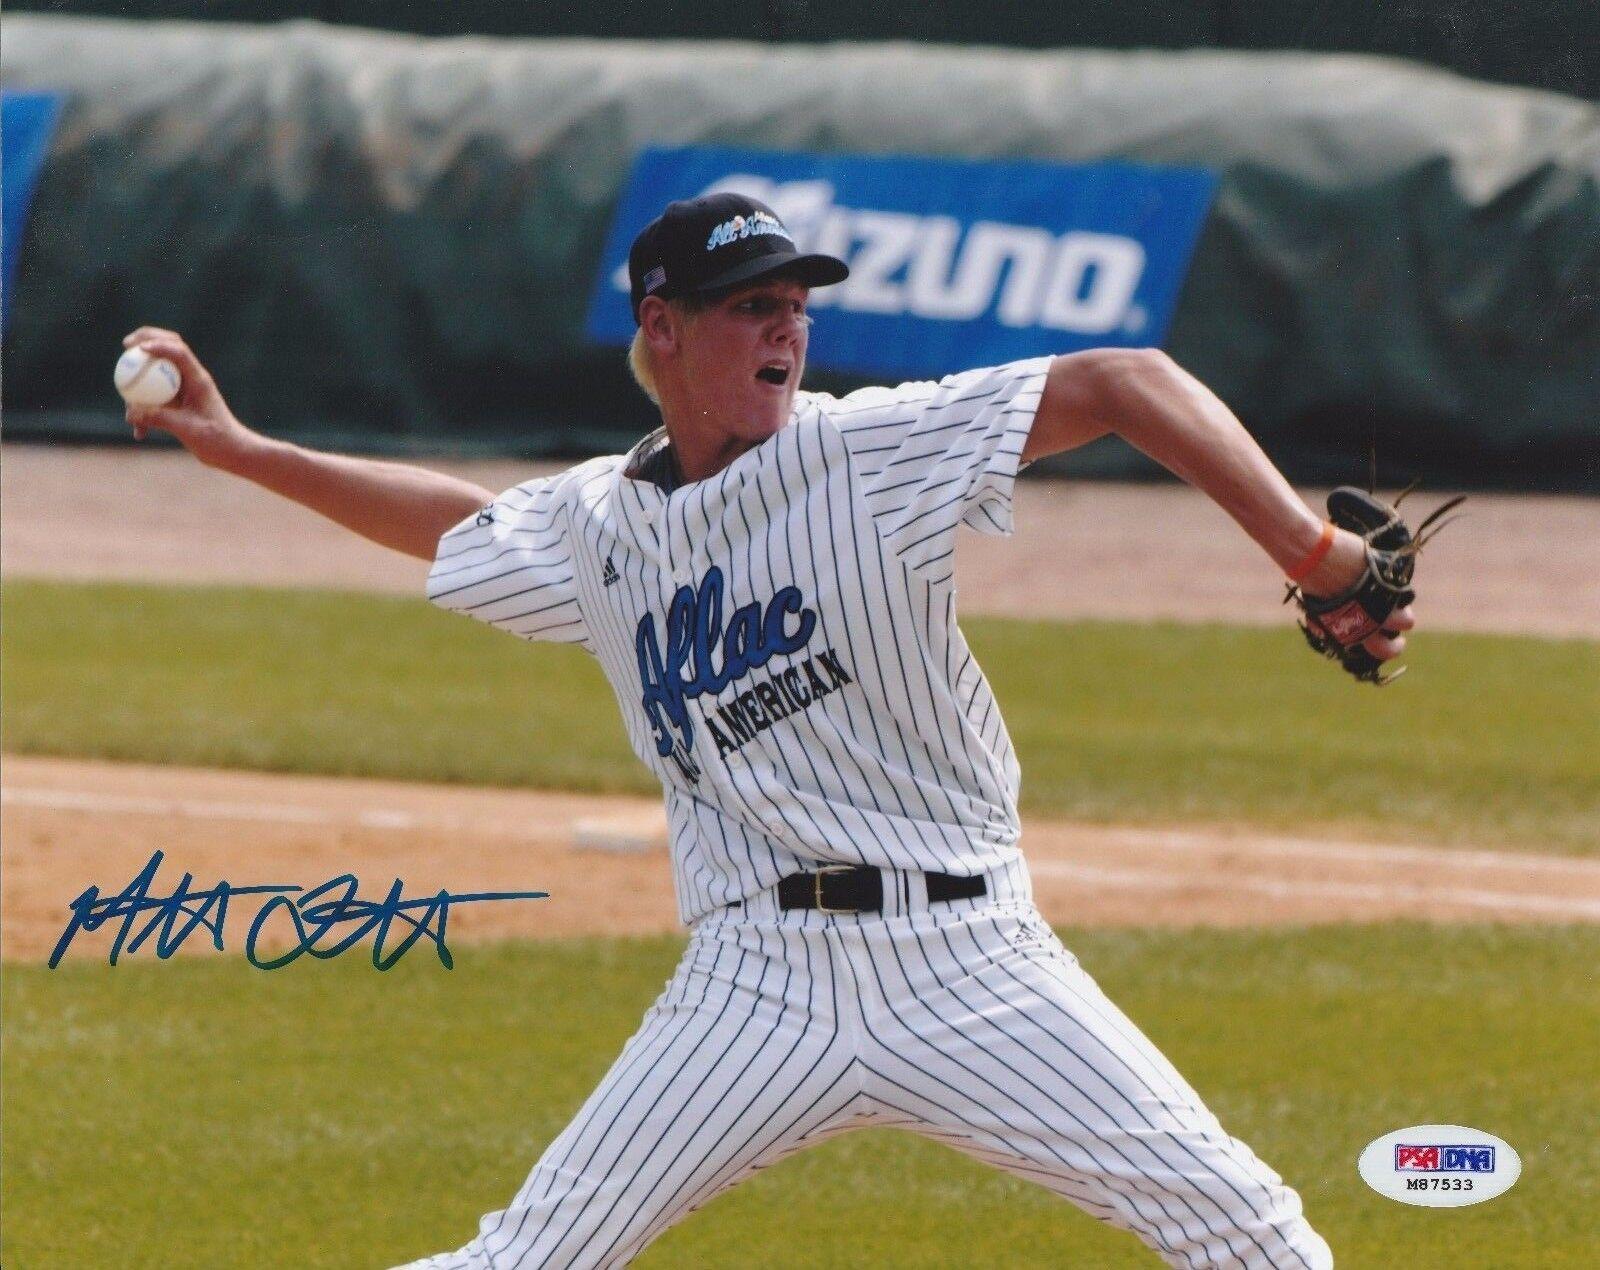 Mat Latos Signed Baseball 8x10 Photo *Aflac Game PSA M87533